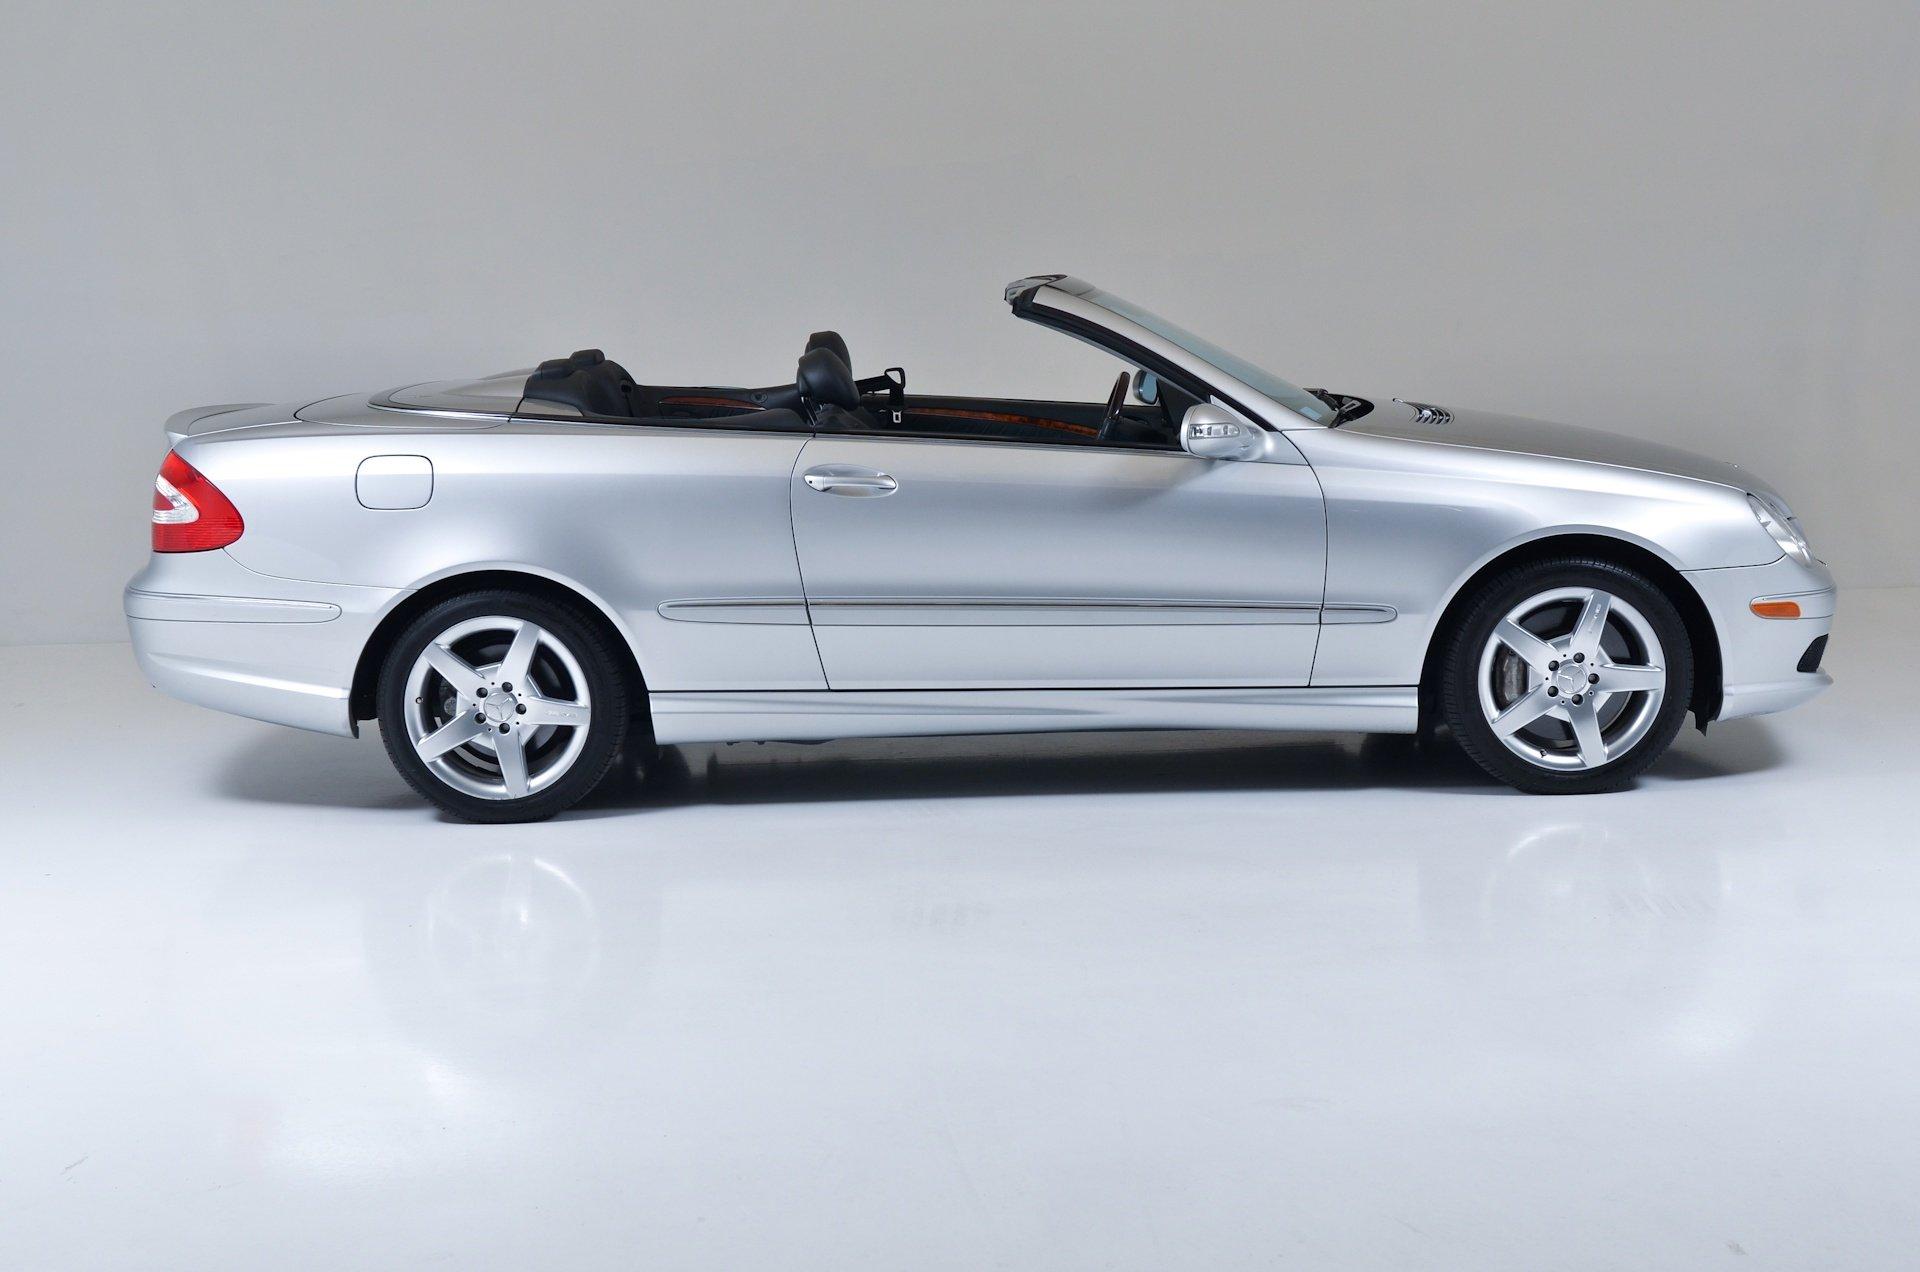 2005 mercedes clk 500 convertible silver cars wallpaper. Black Bedroom Furniture Sets. Home Design Ideas